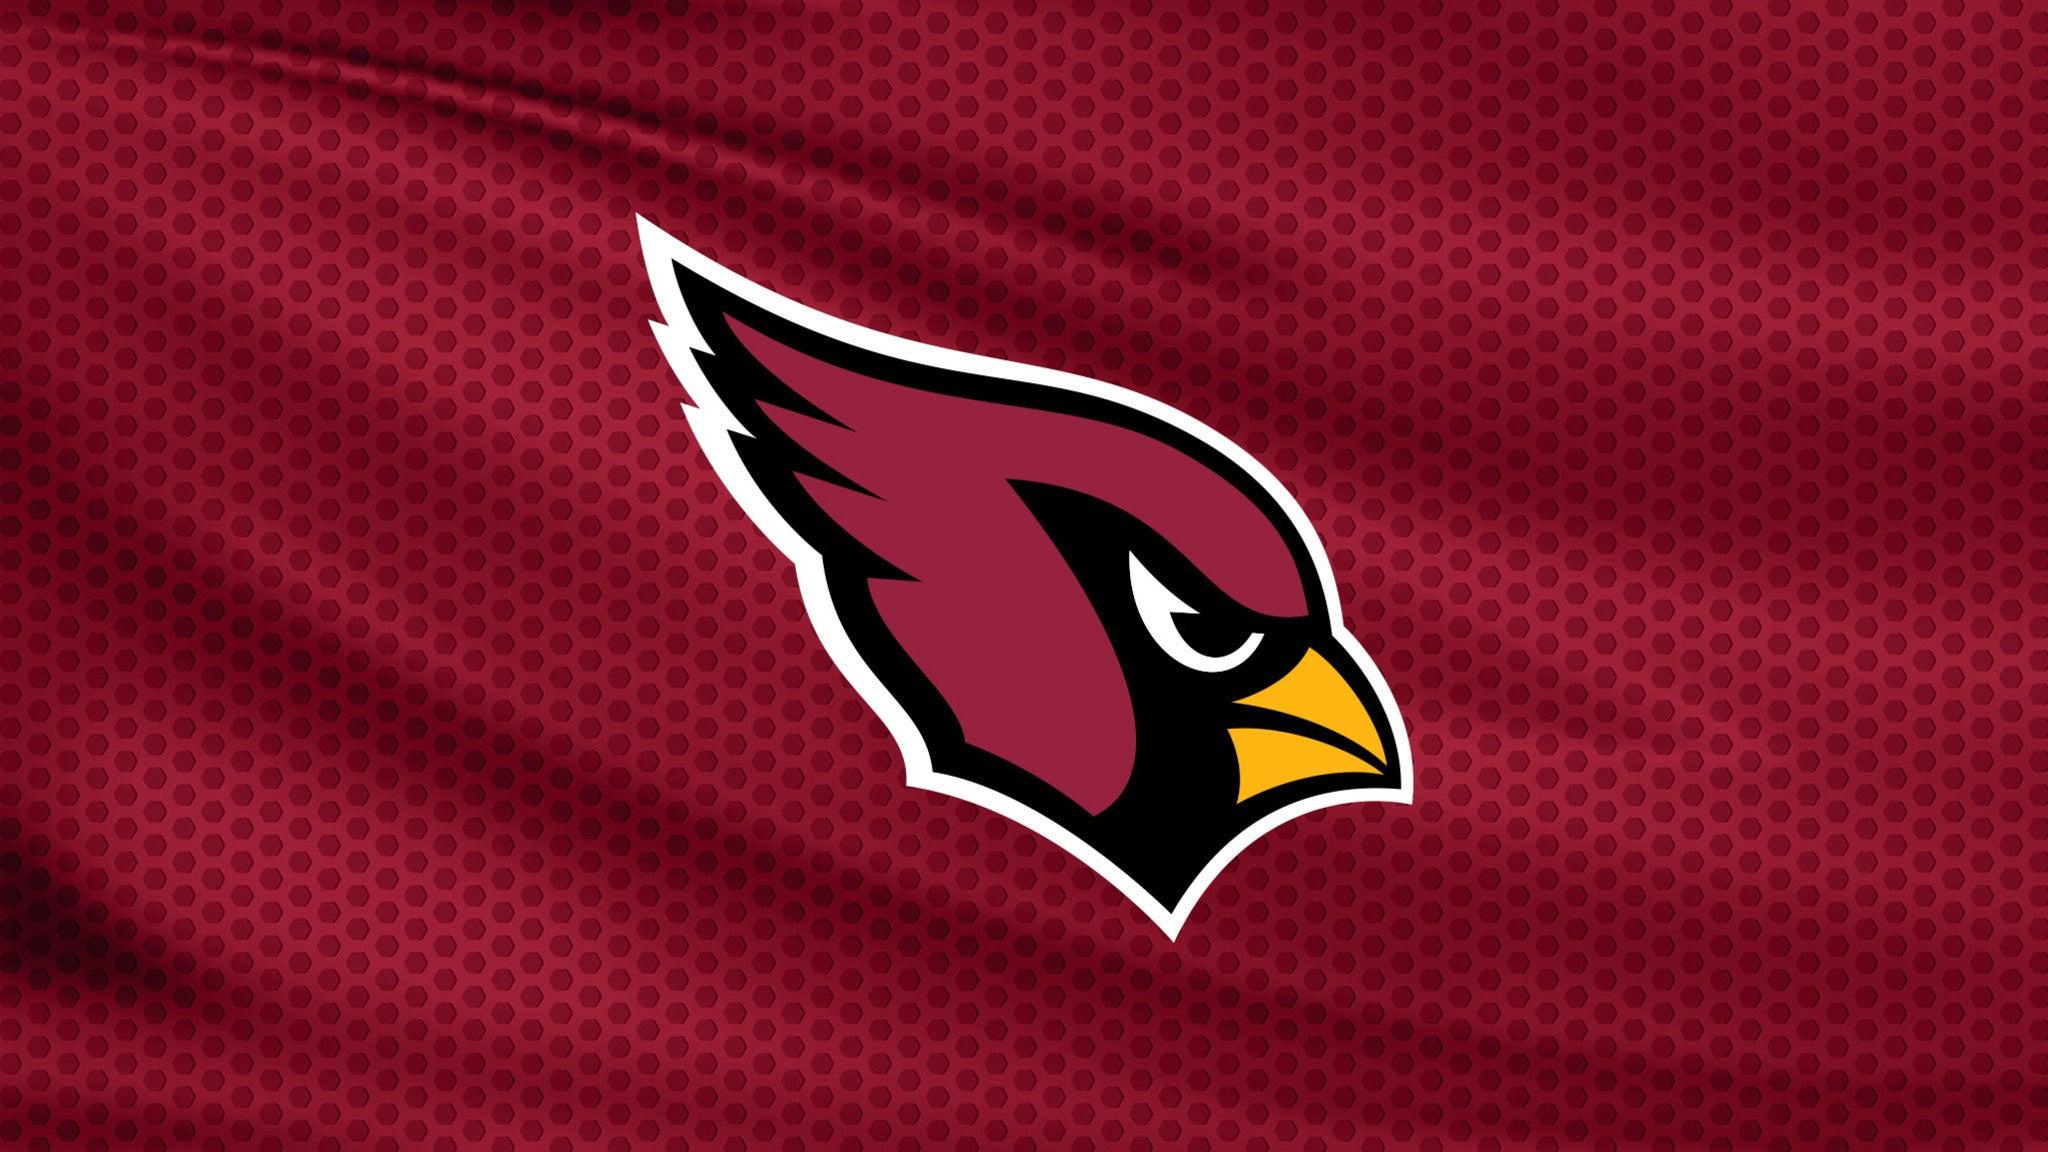 Arizona Cardinals v. Houston Texans at State Farm Stadium - Glendale, AZ 85305